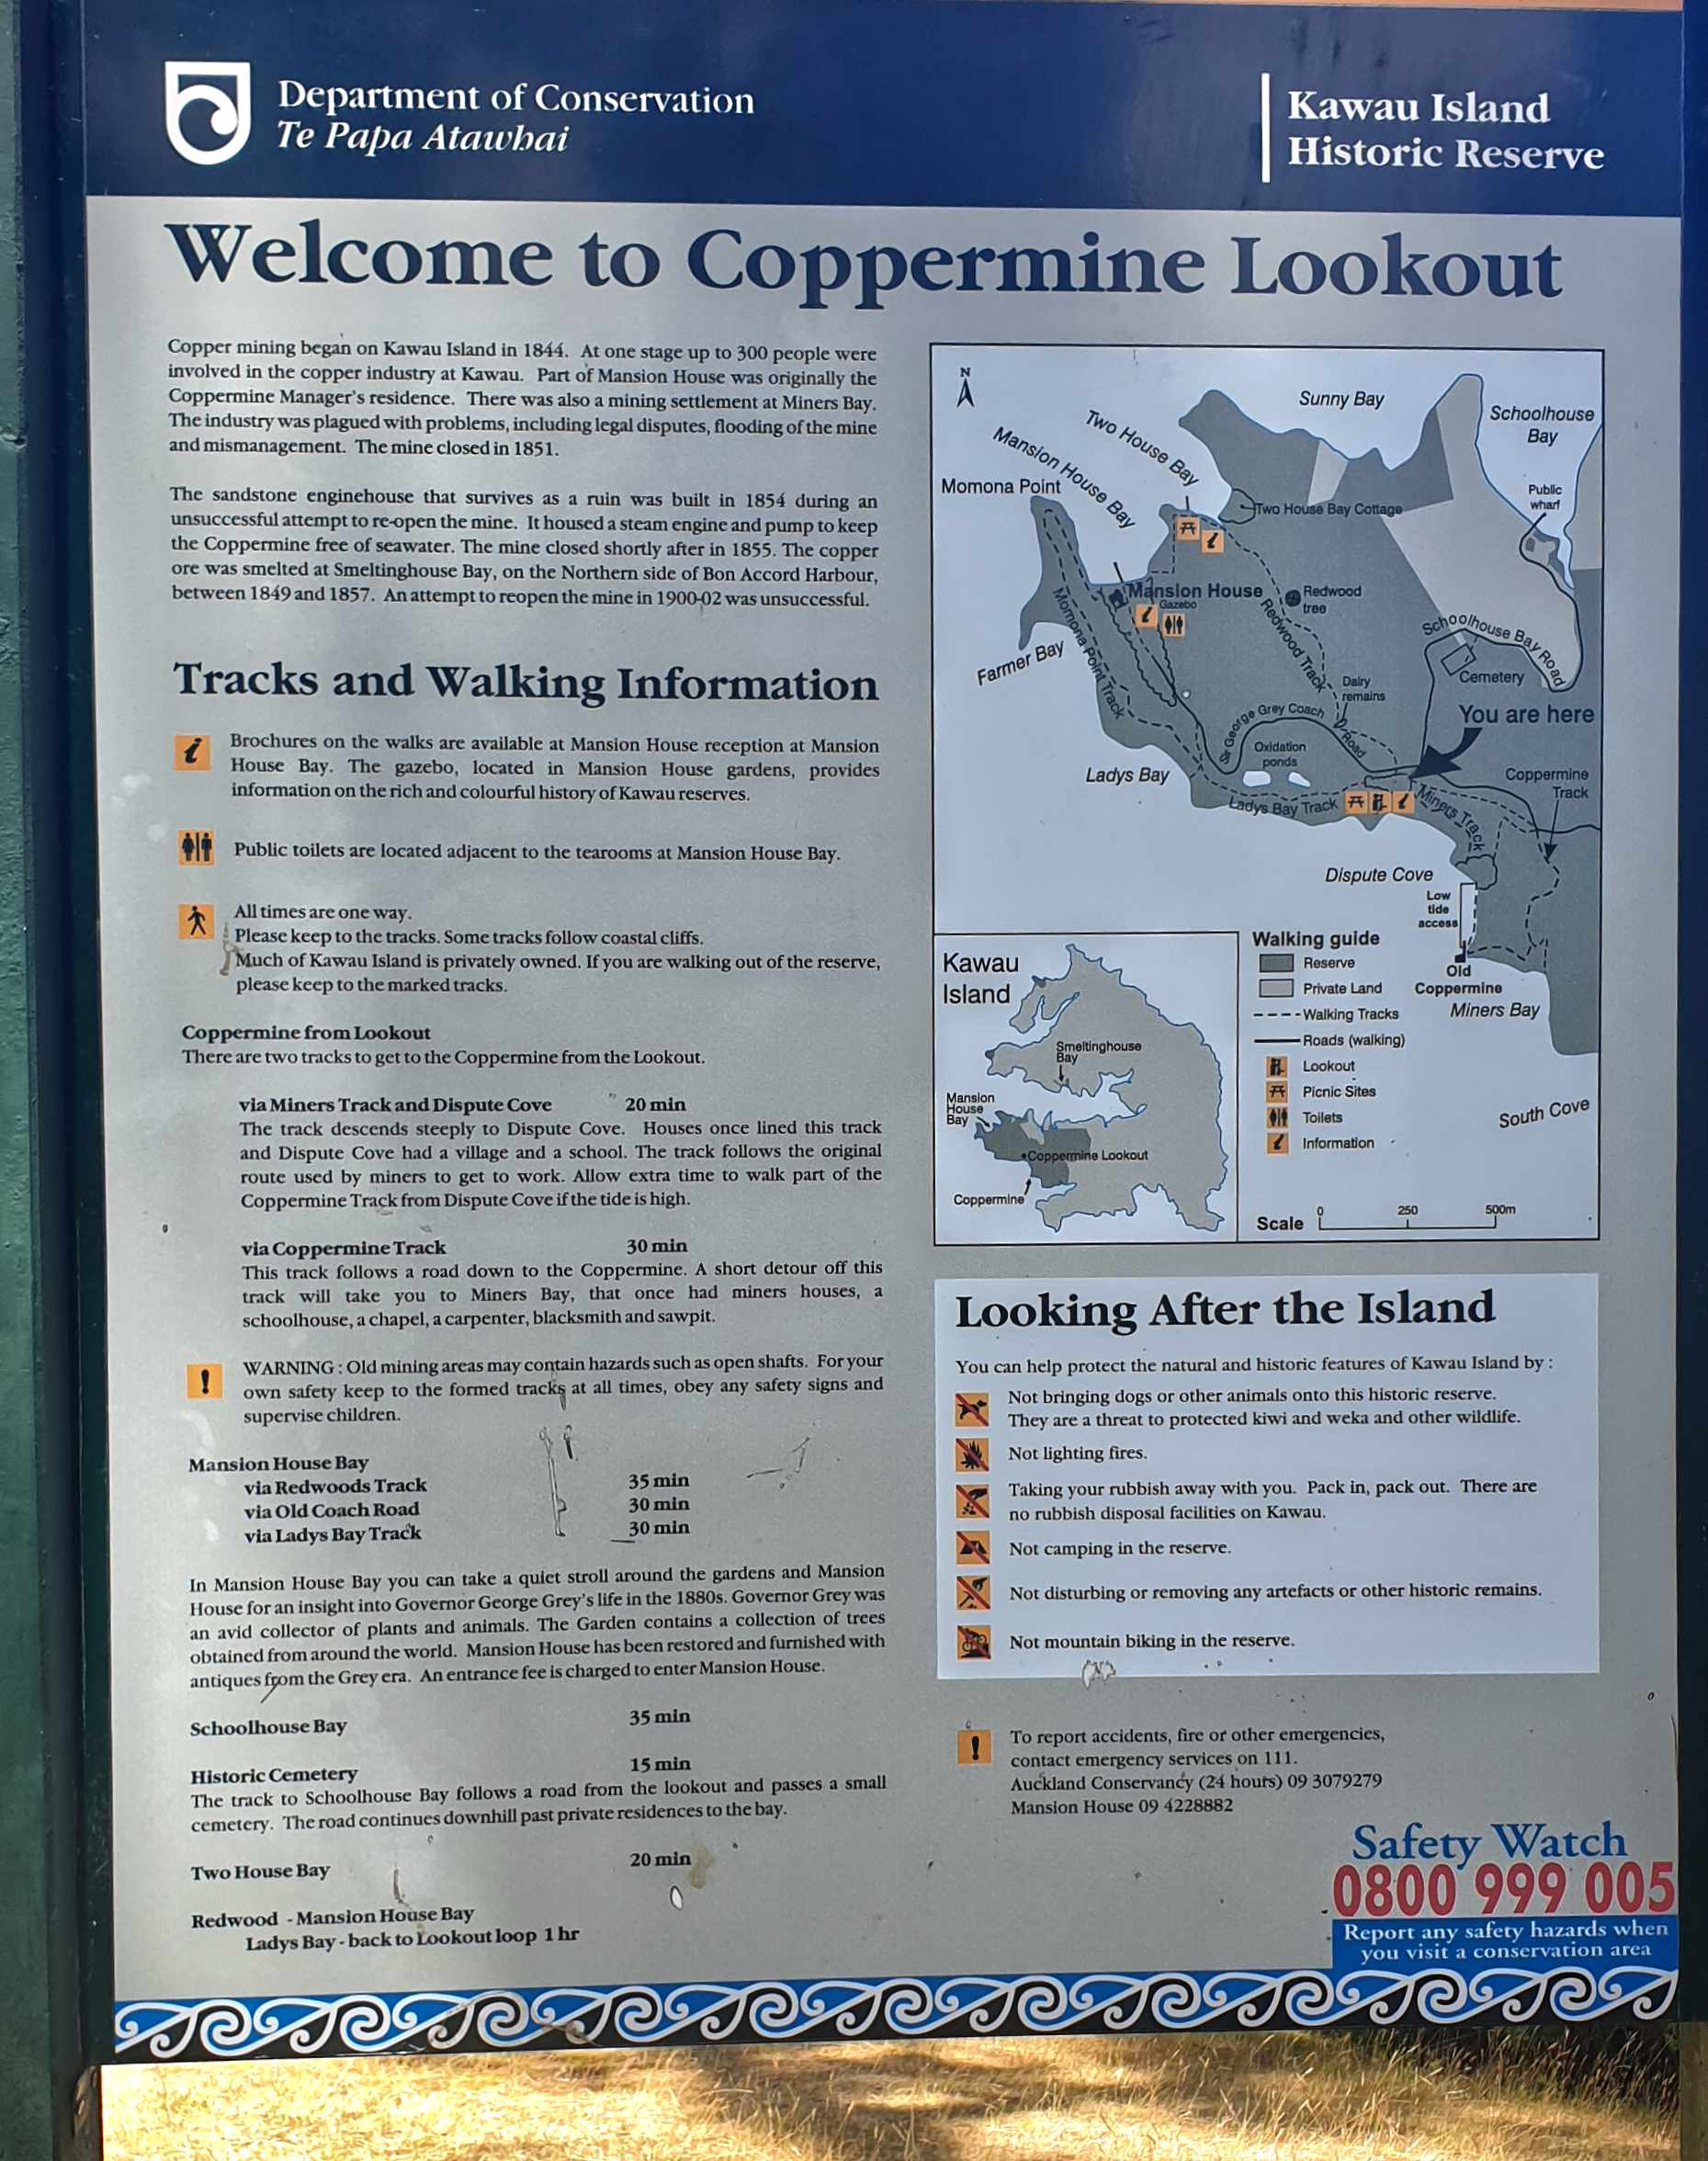 Coppermine Lookout Kawau Island, Auckland